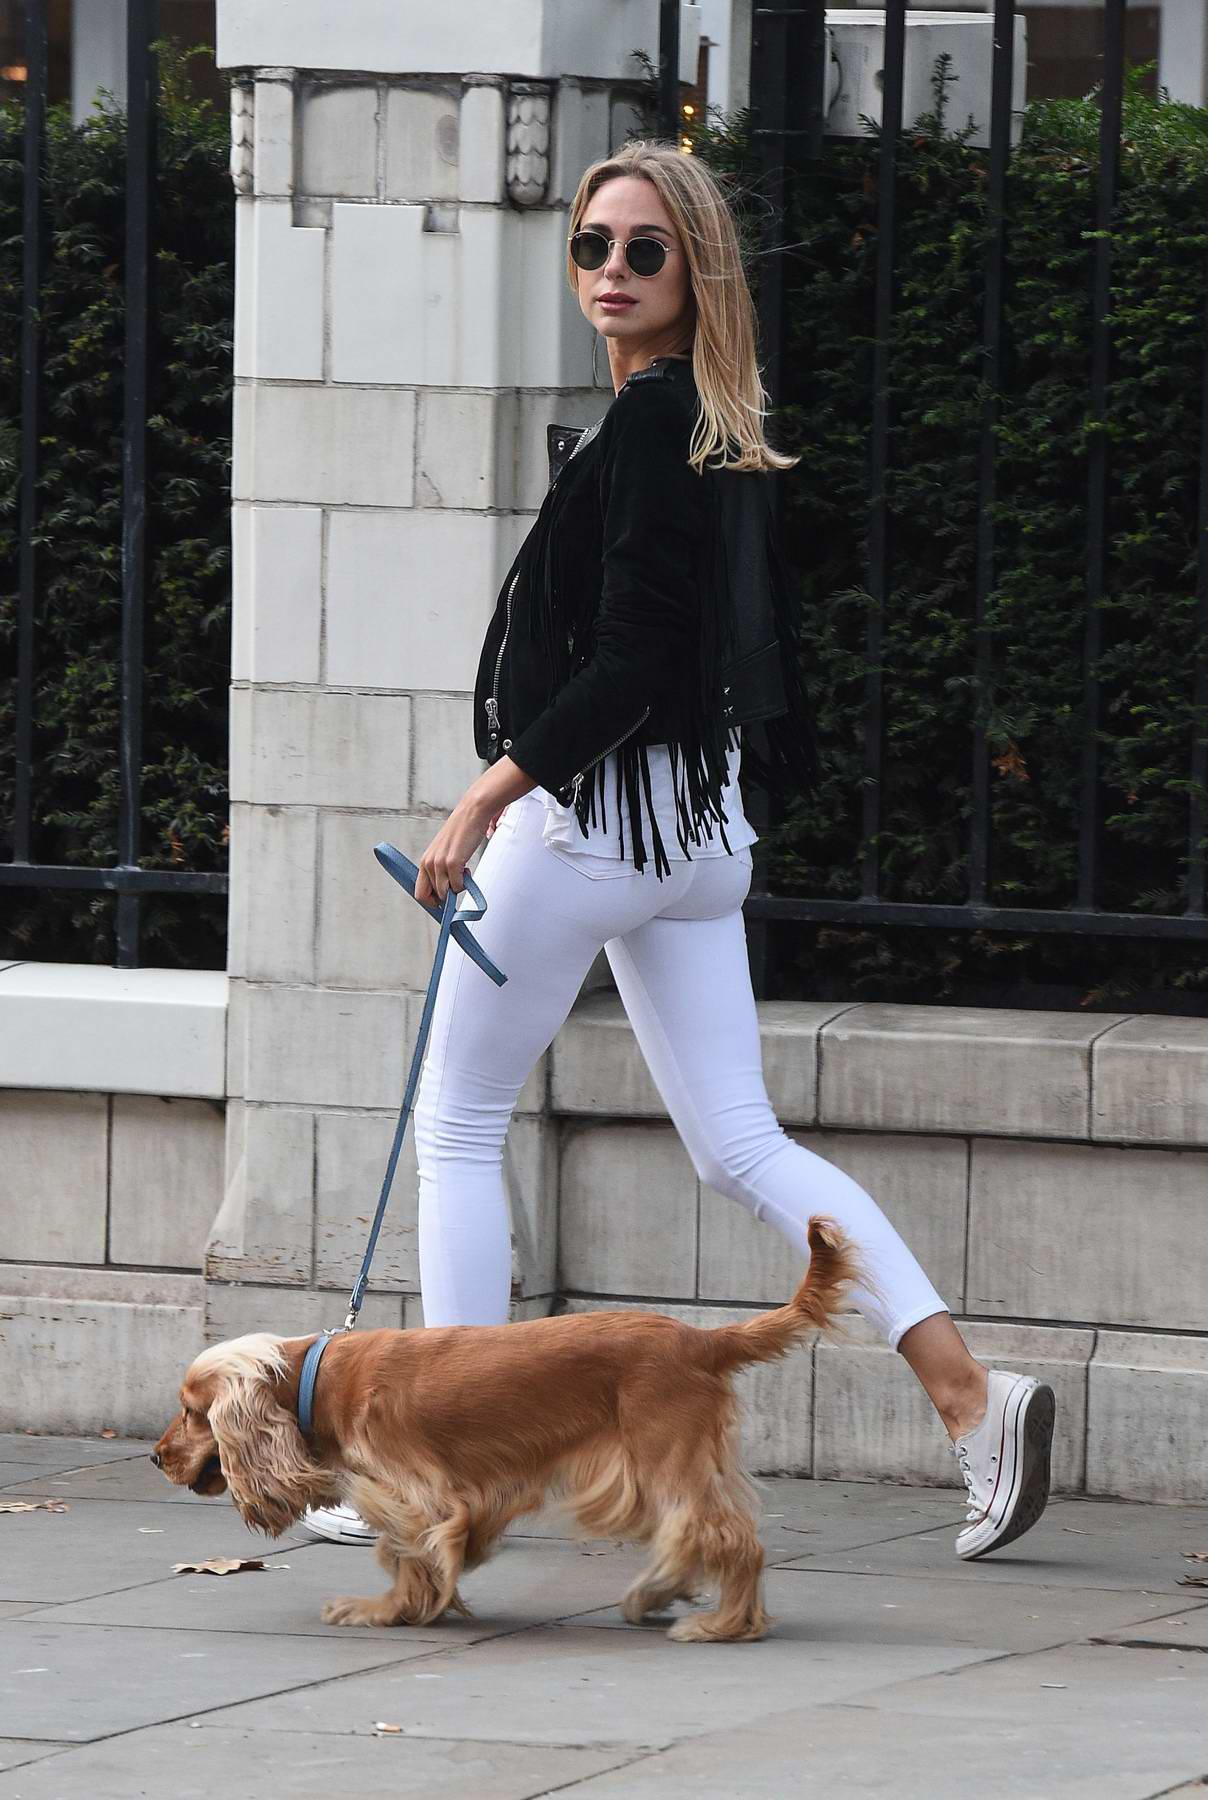 Kimberley Garner takes a stroll on the Kings Road in Chelsea, UK